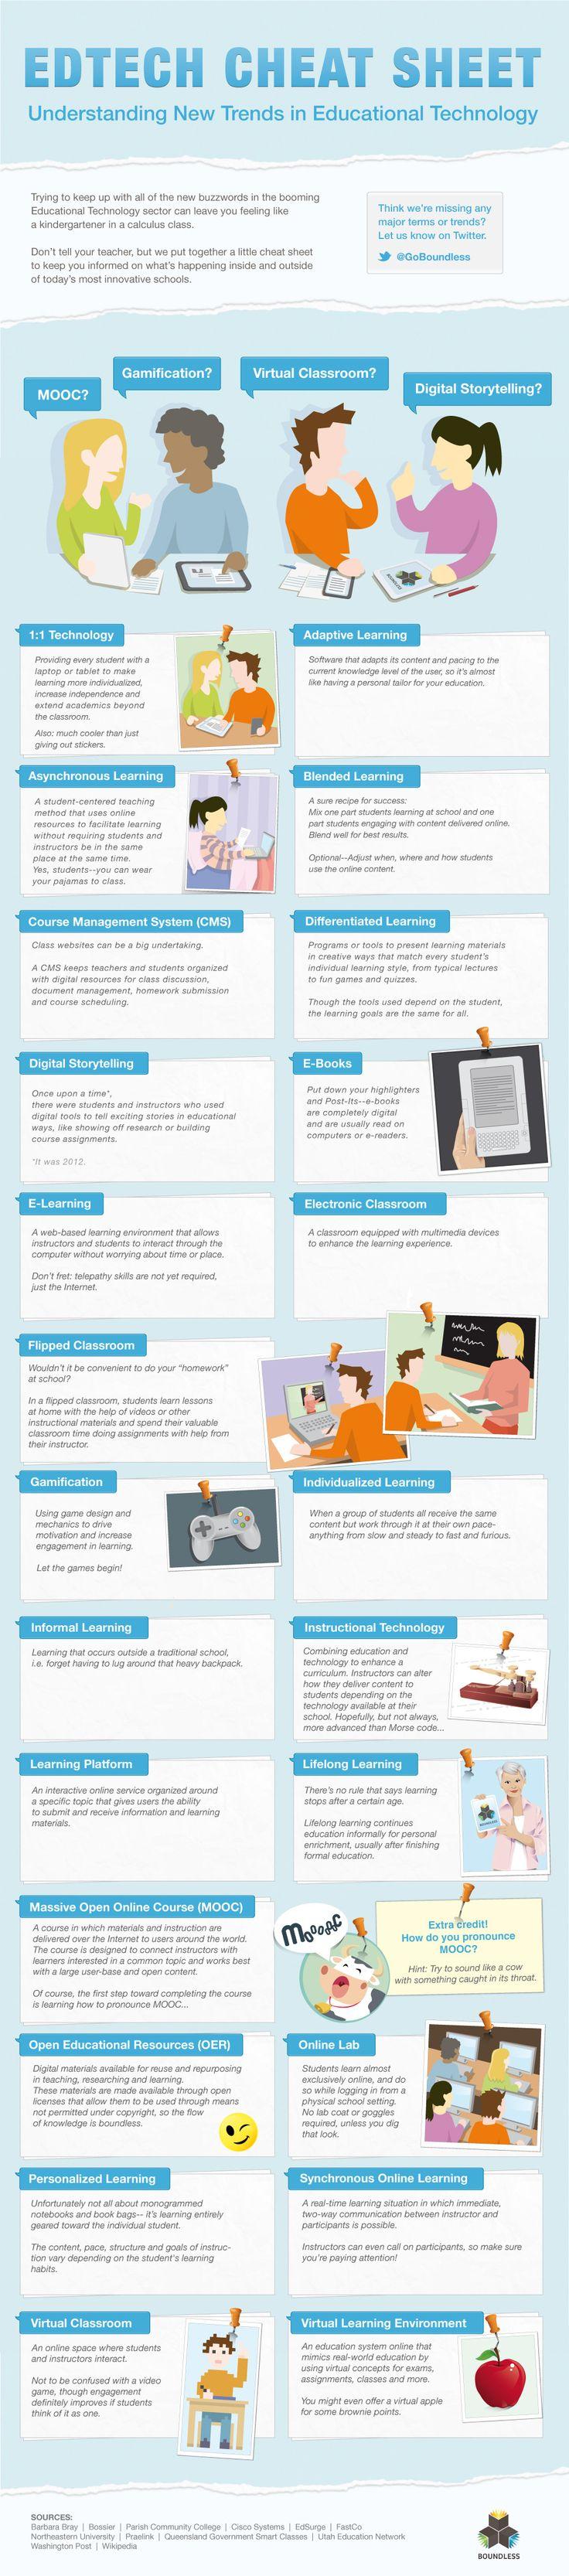 Educational Technology Trends Cheat Sheet